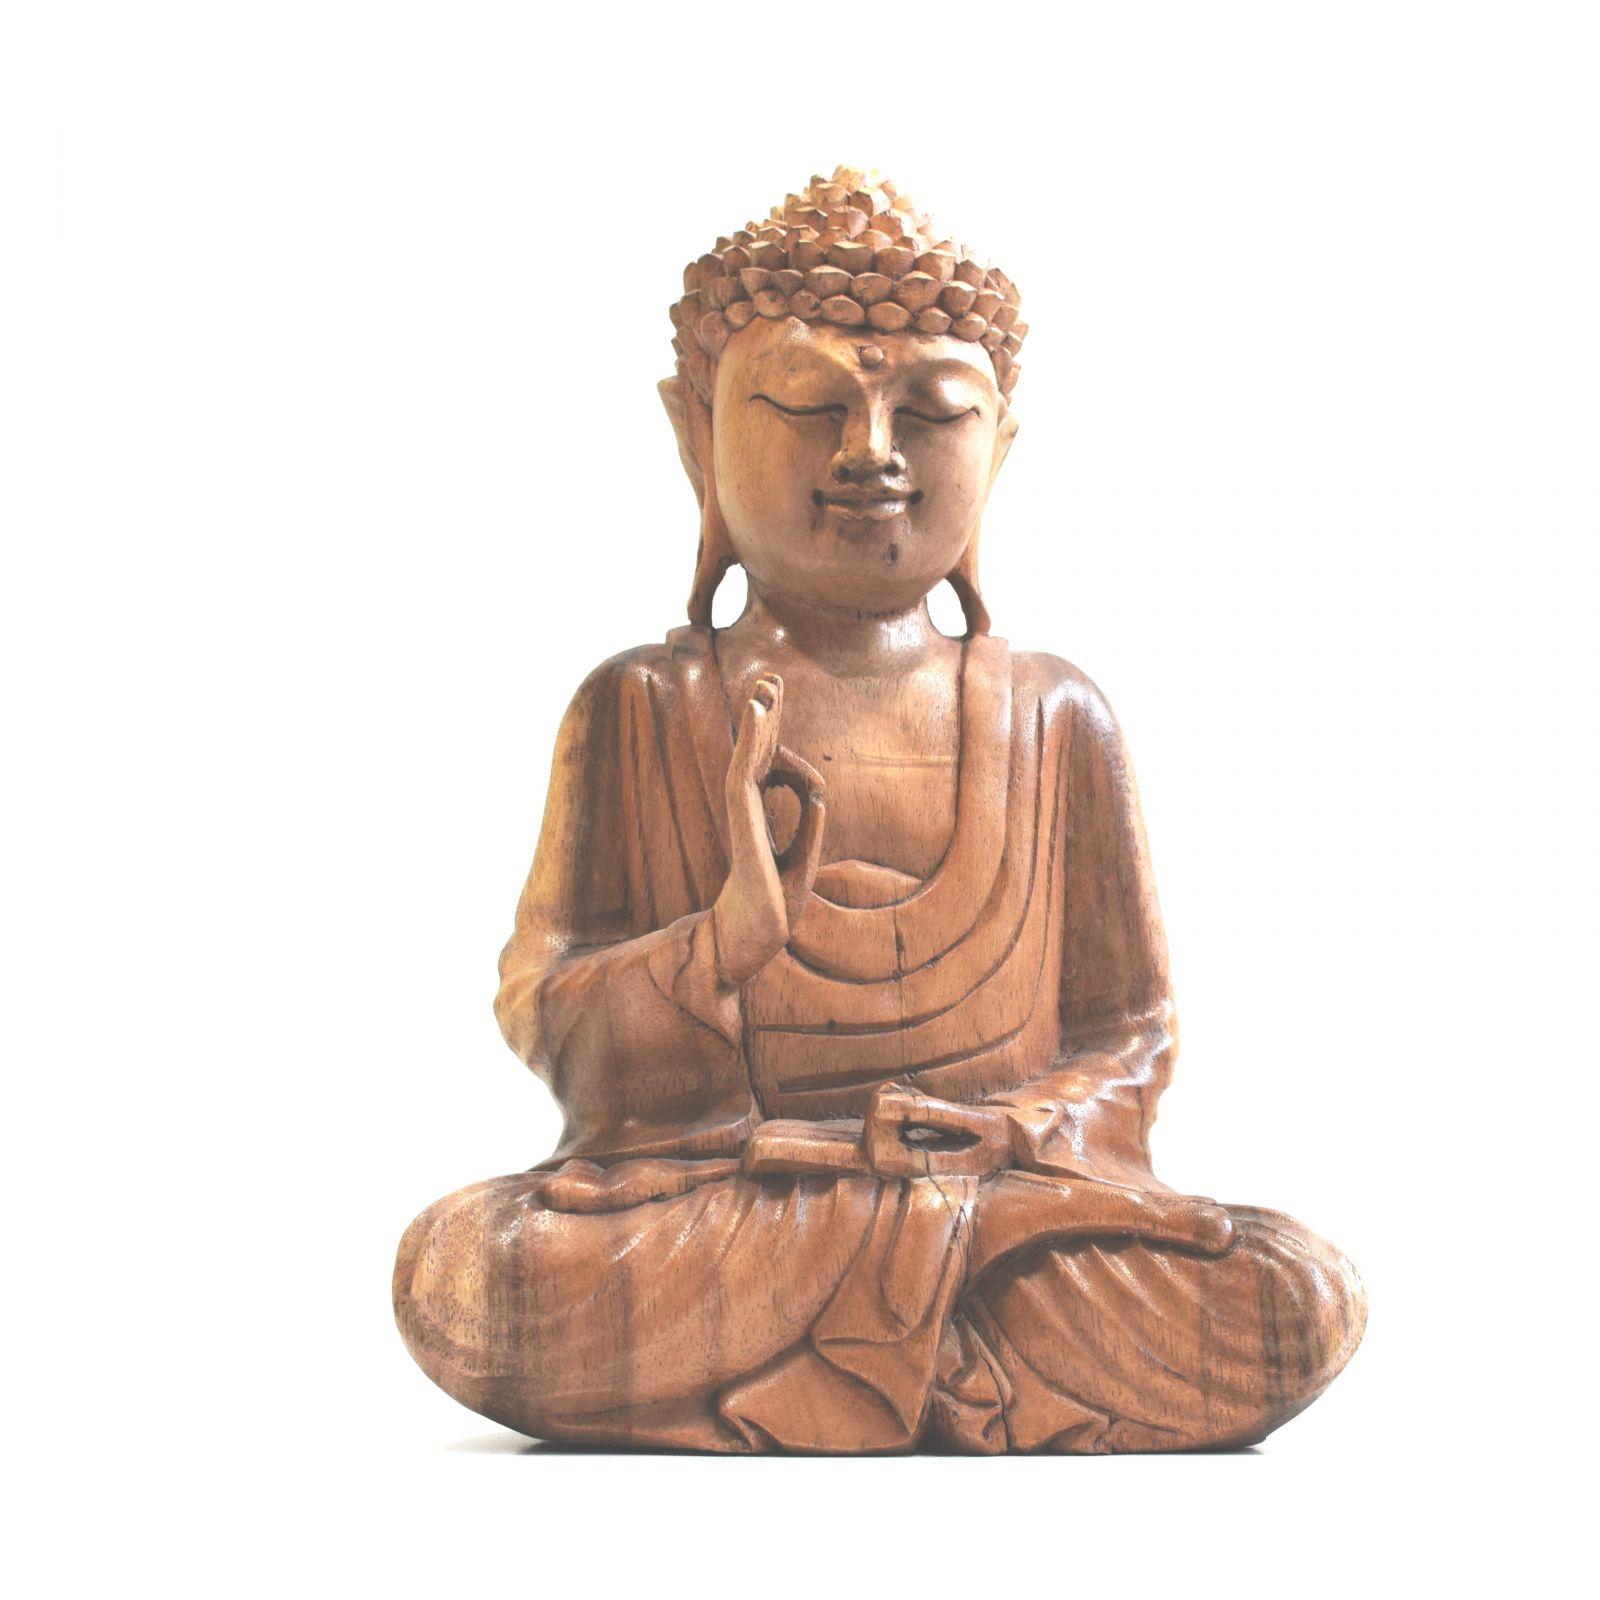 Soška Buddha dřevo 27 cm světlý Indonesie